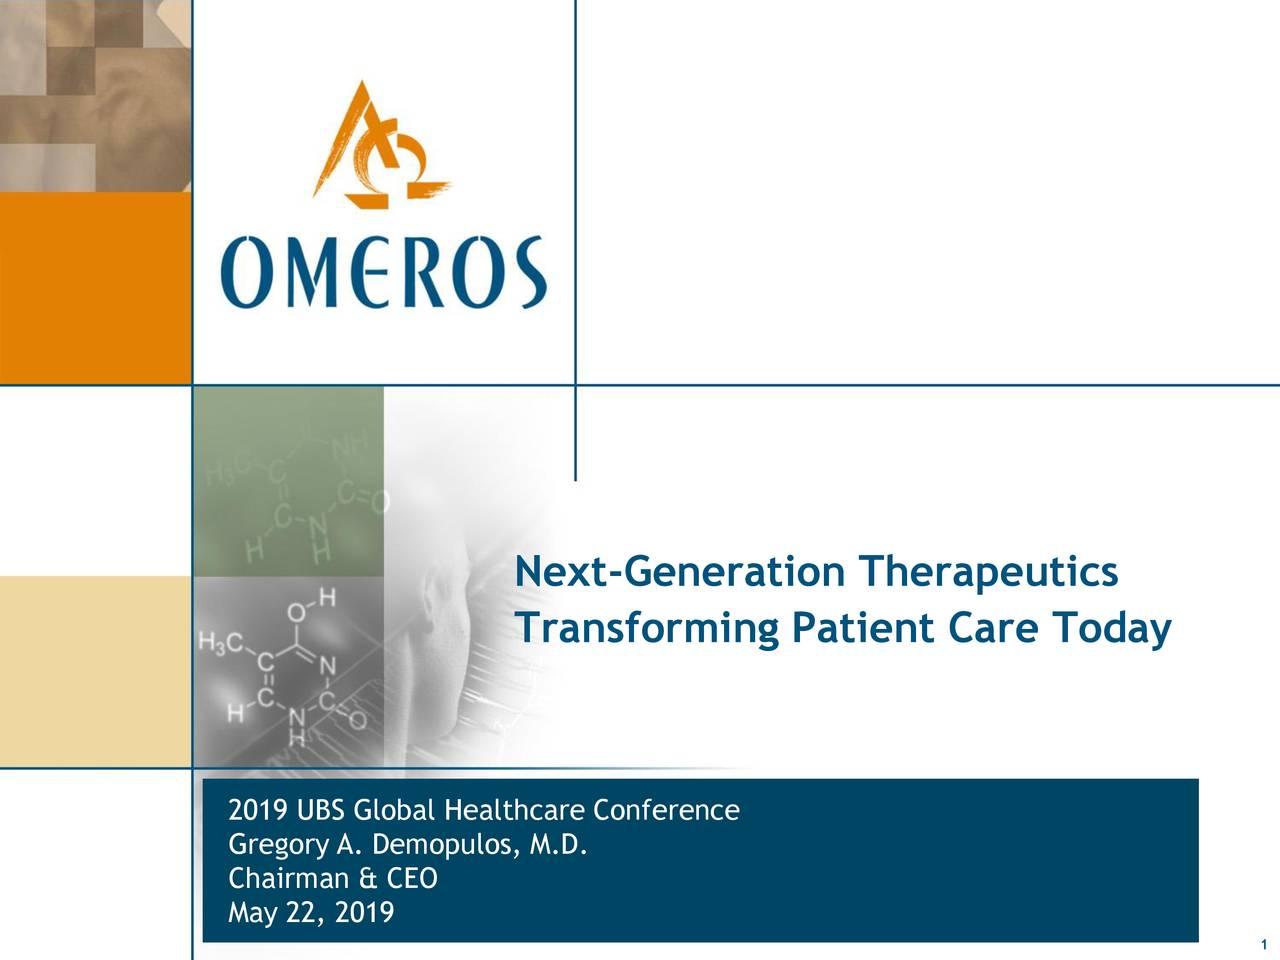 Next-Generation Therapeutics